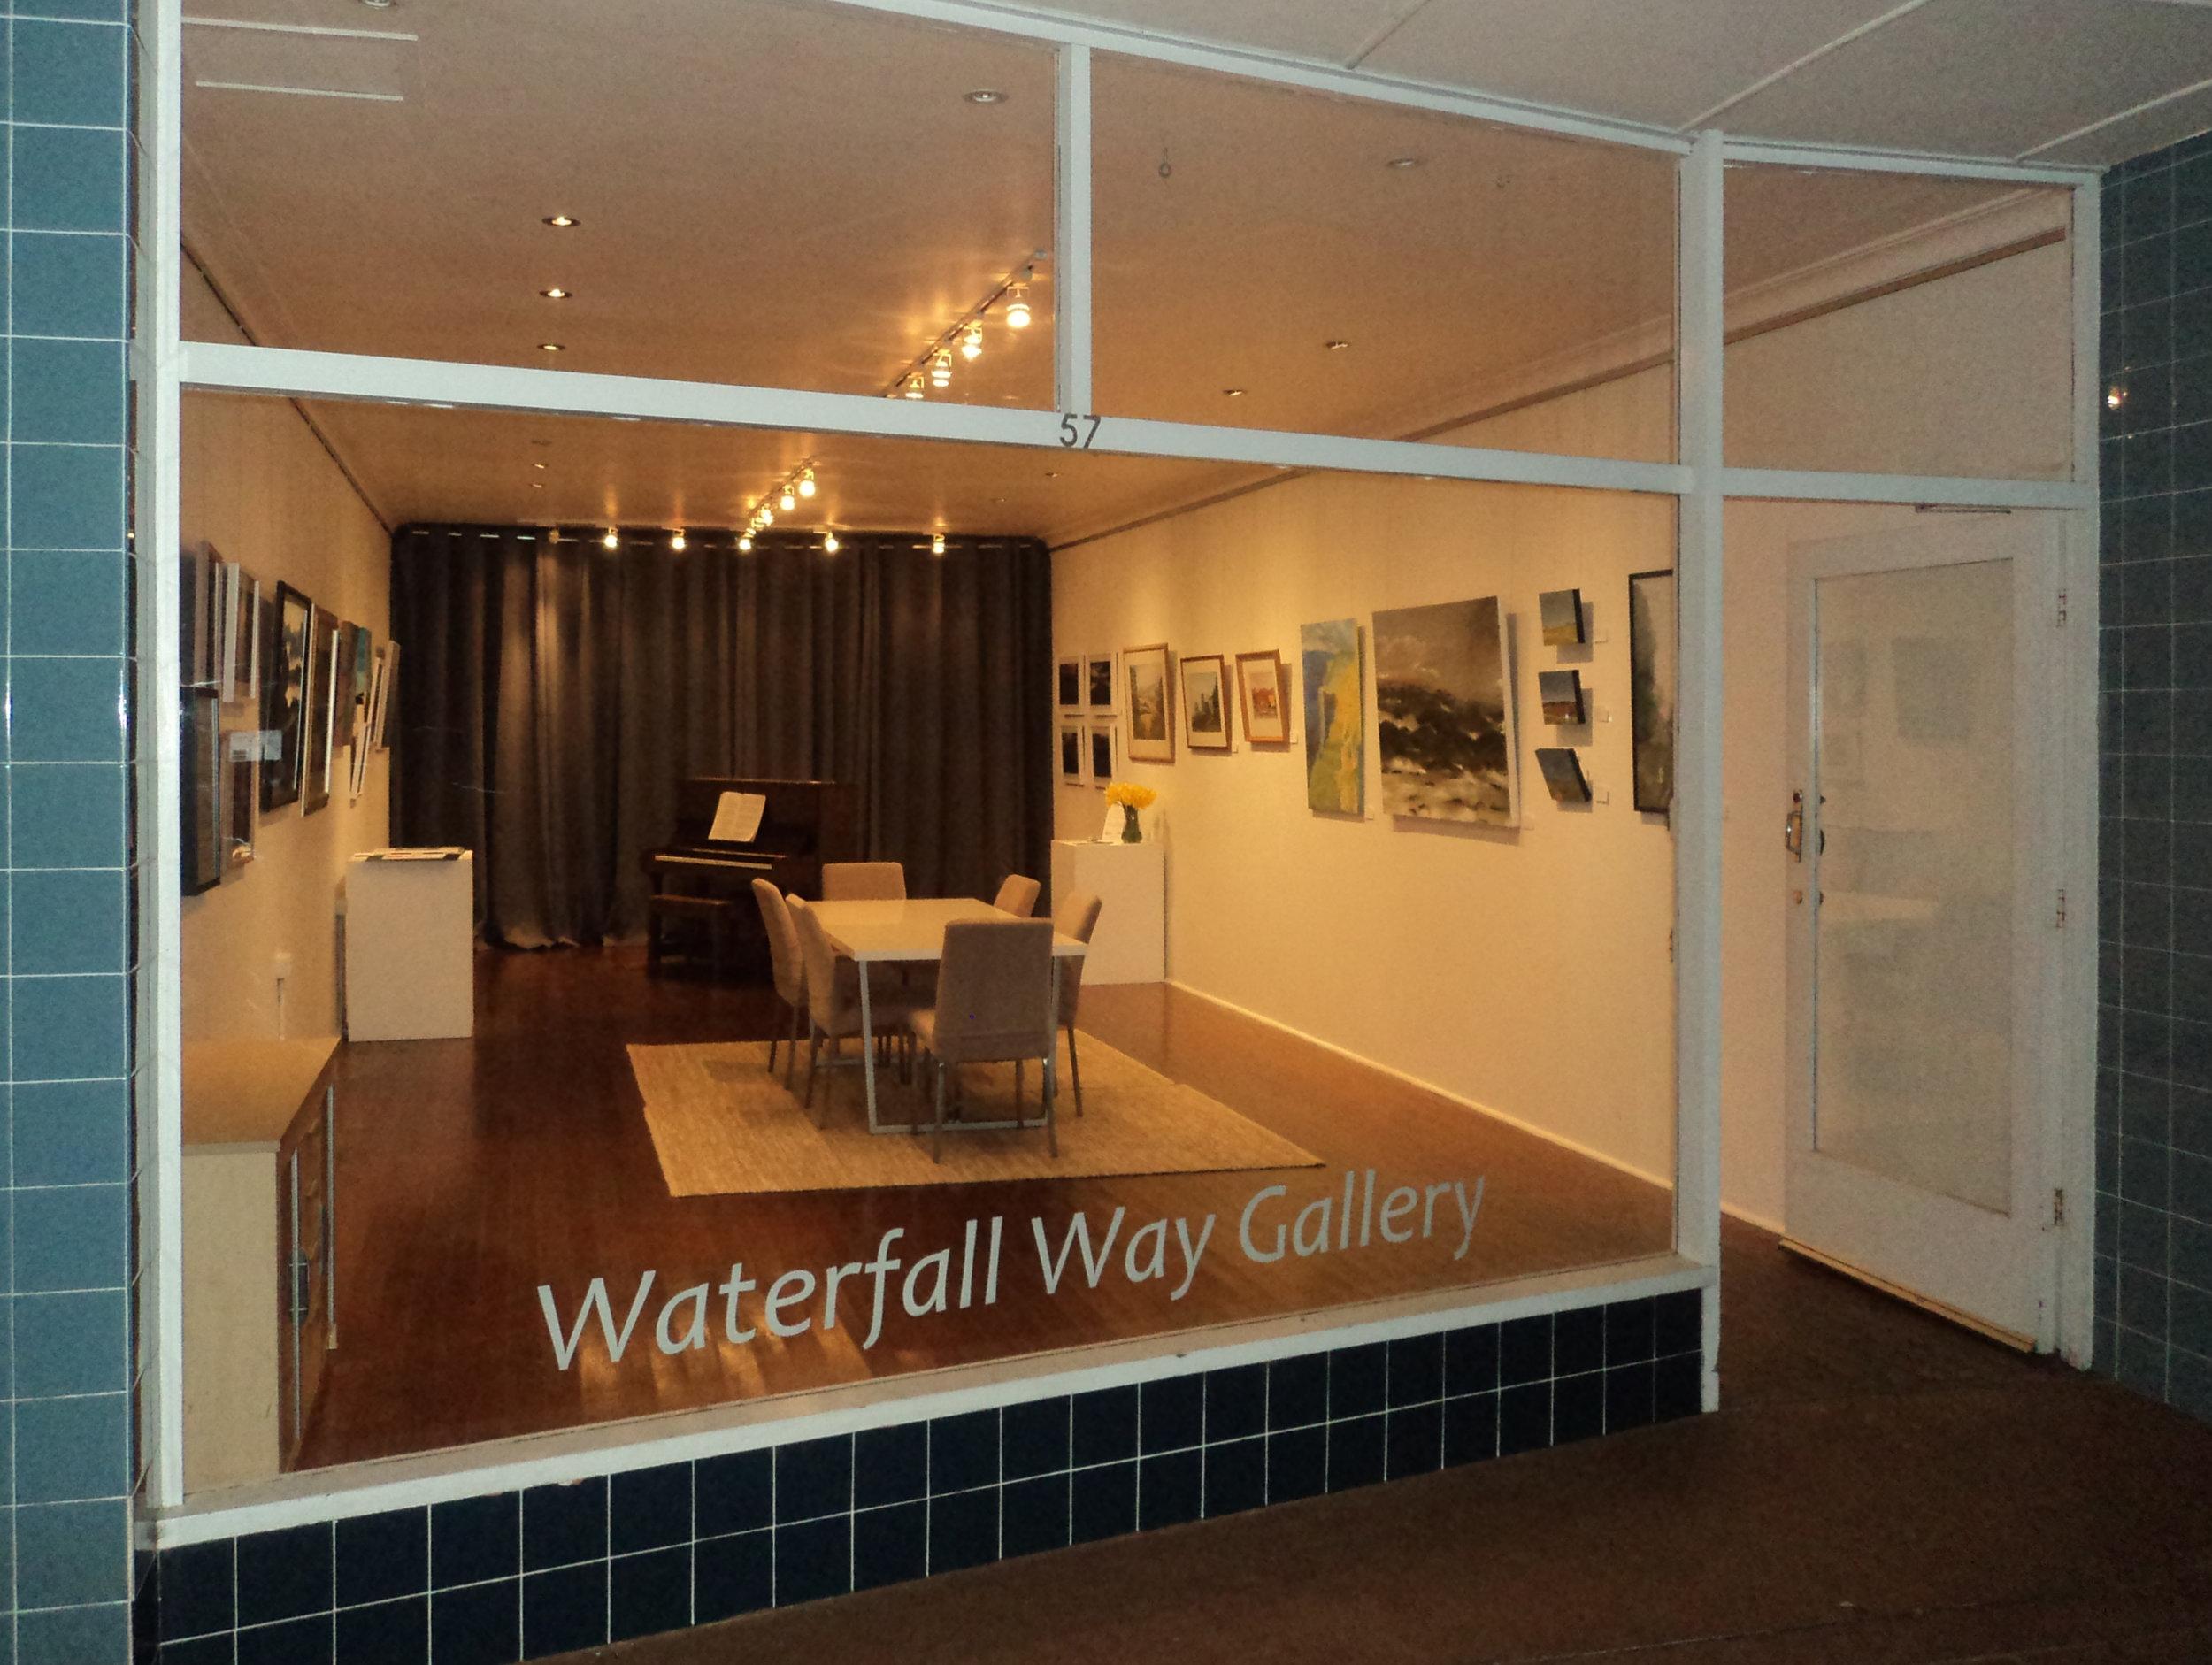 Waterfall Way Gallery